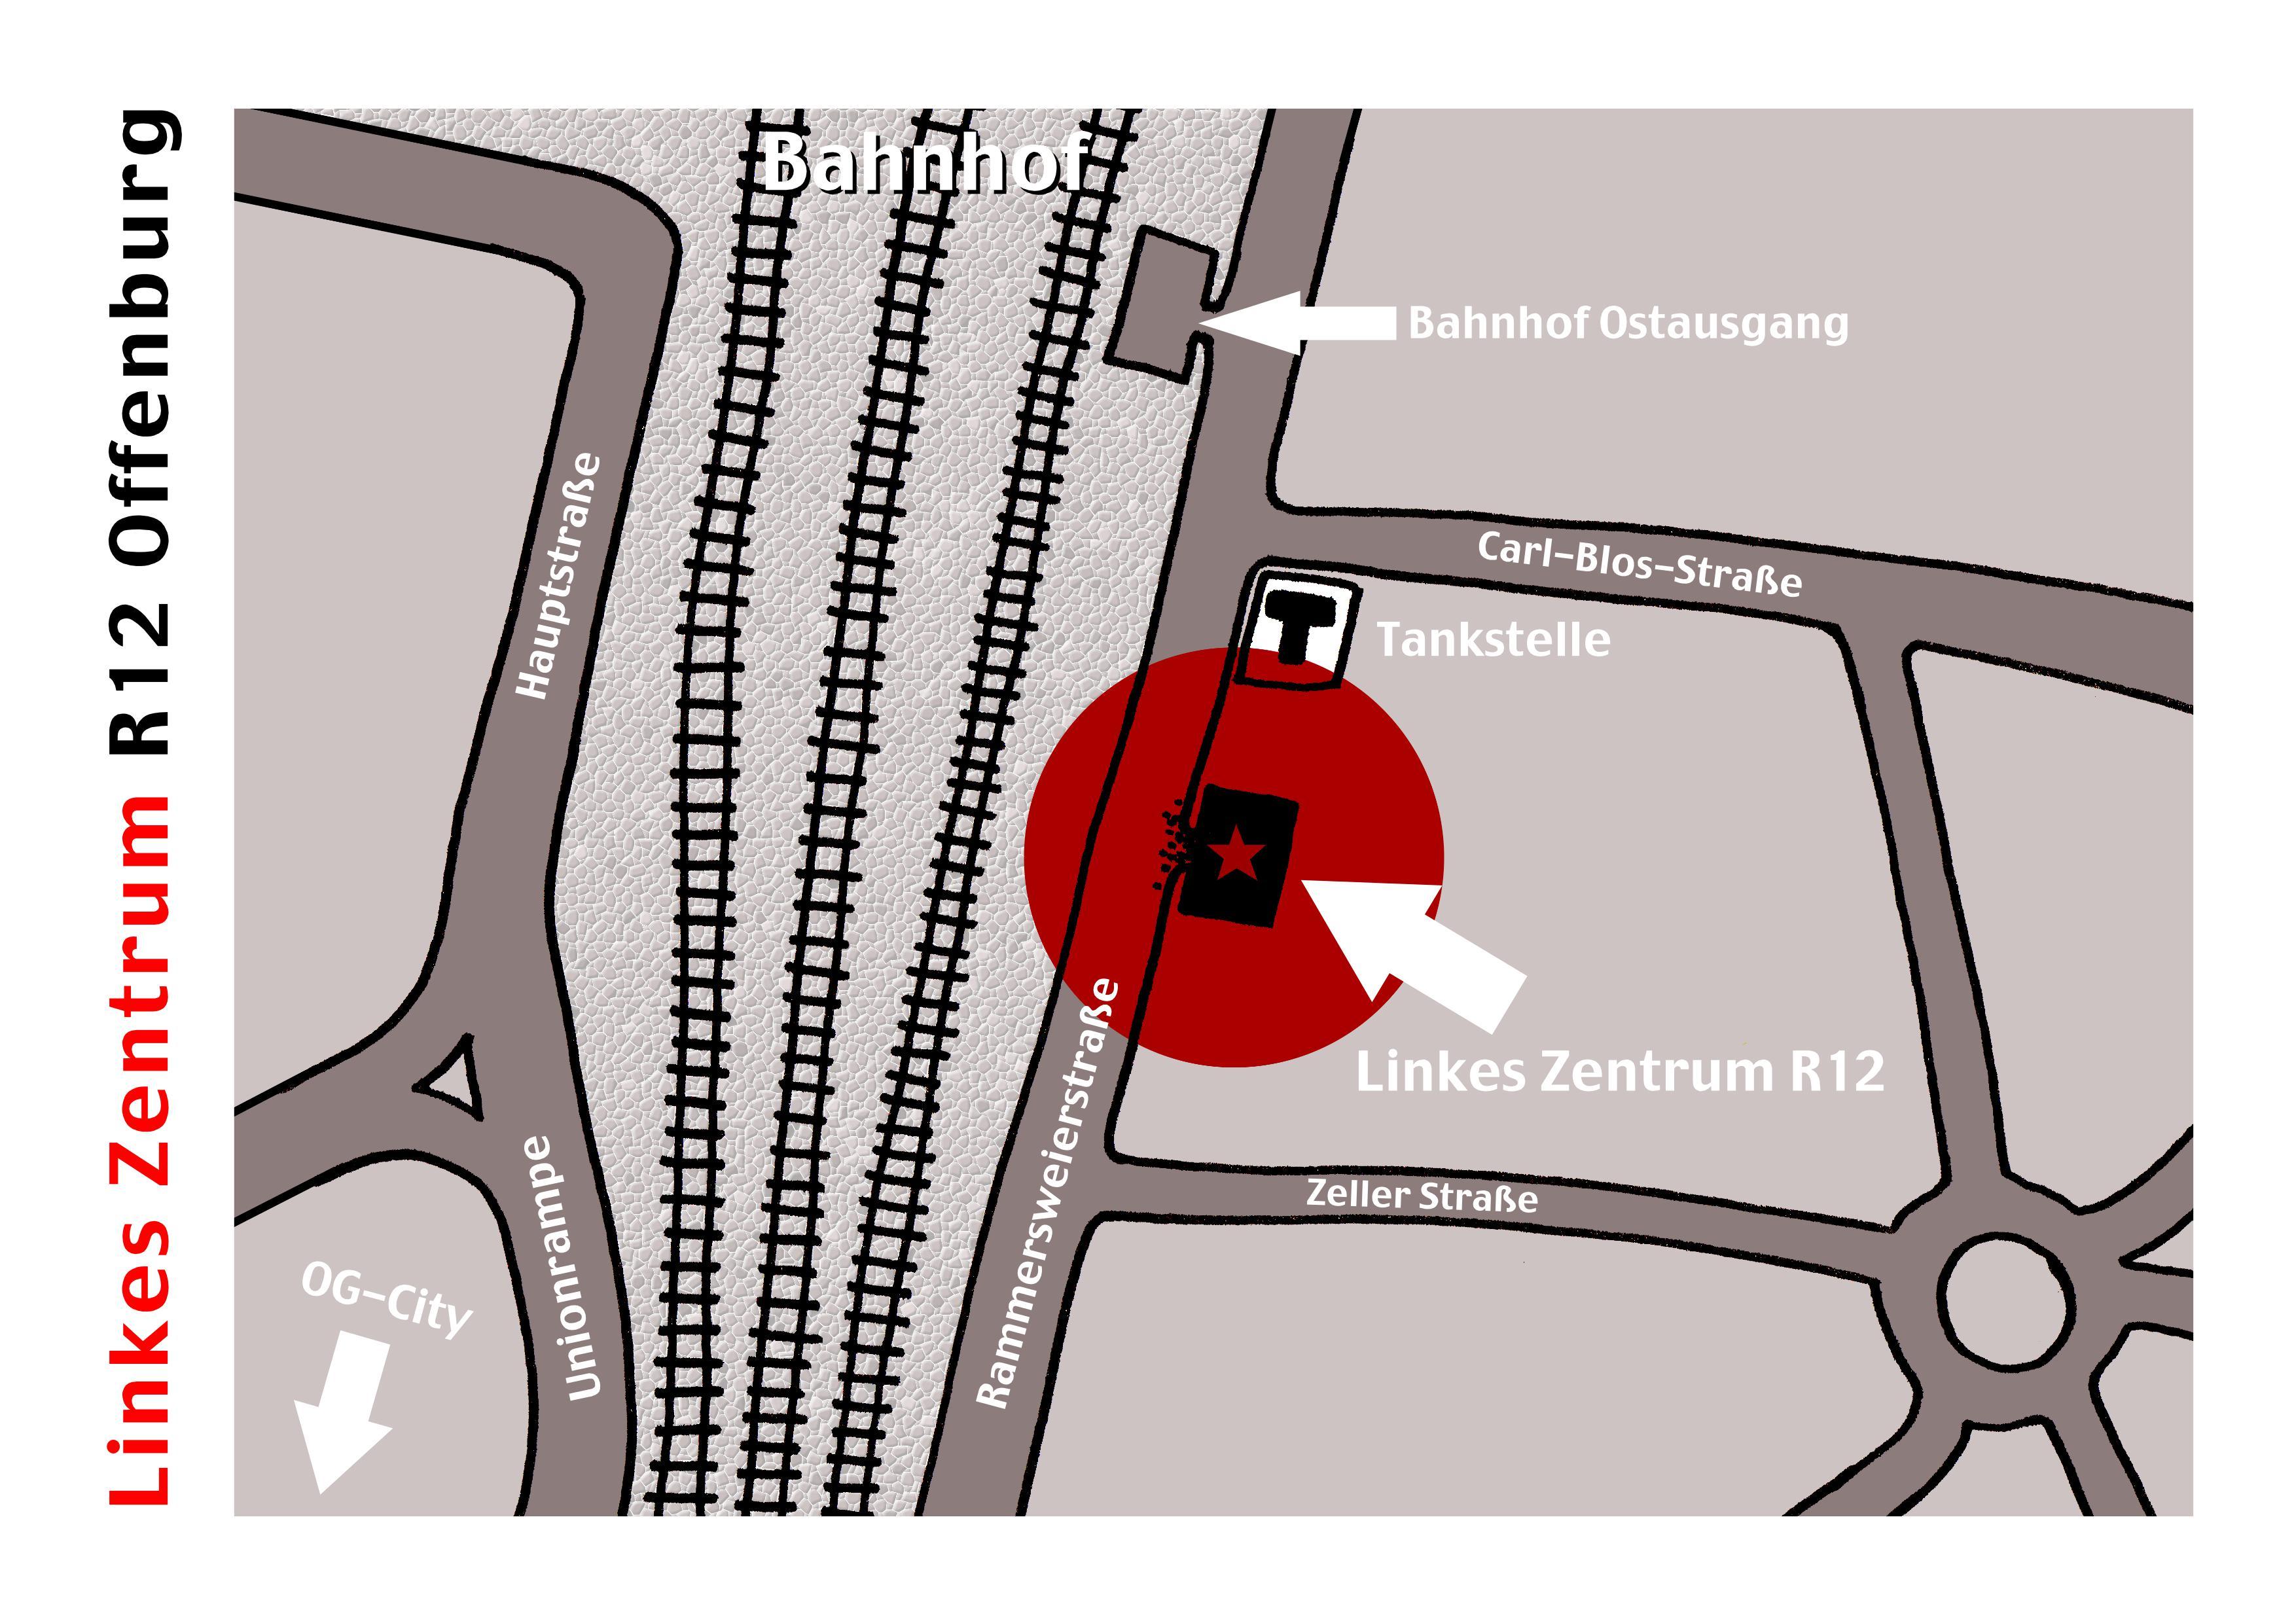 Wegbeschreibung Linkes Zentrum R12 Offenhurg